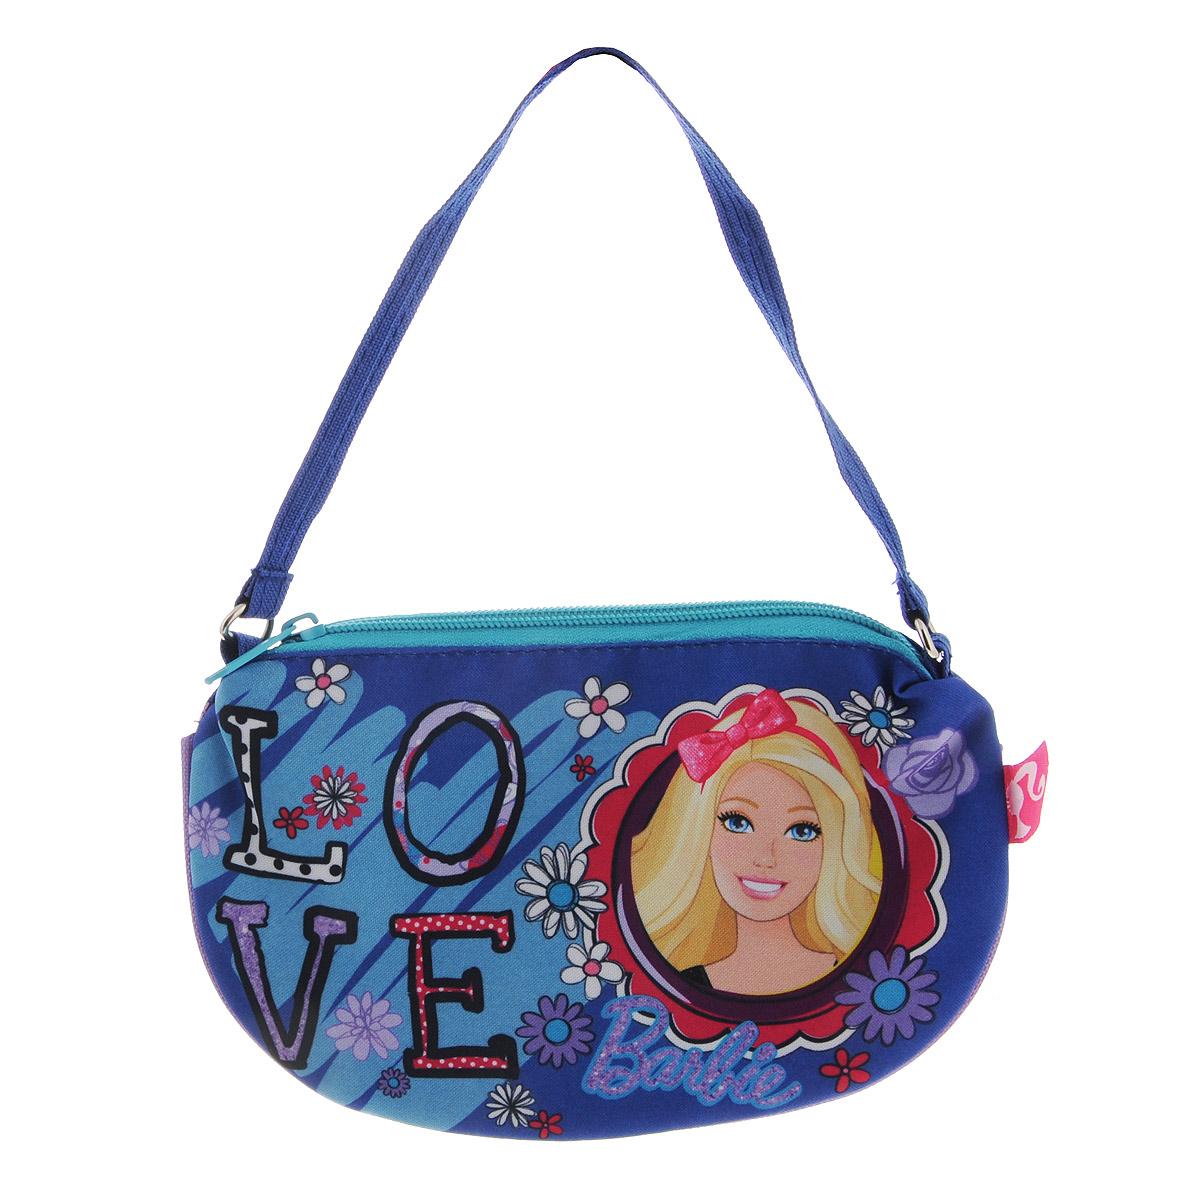 Сумочка Barbie, цвет: синий. BRCB-UT4-4017 сумочка princess цвет розовый prcb ut4 4017